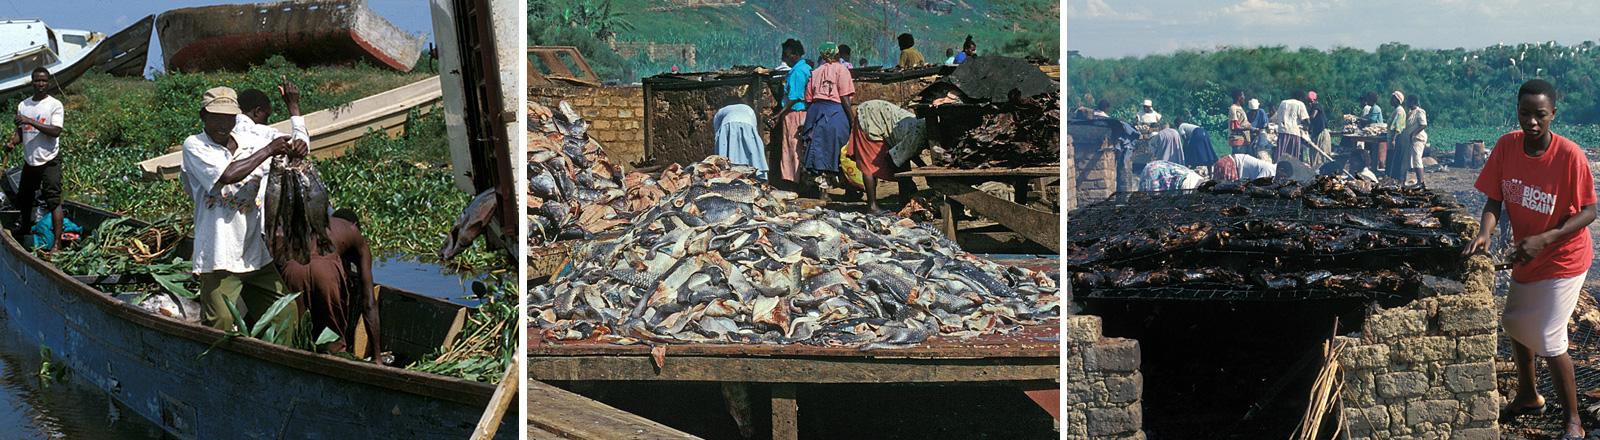 Nilbarsche in Uganda am Victoriasee